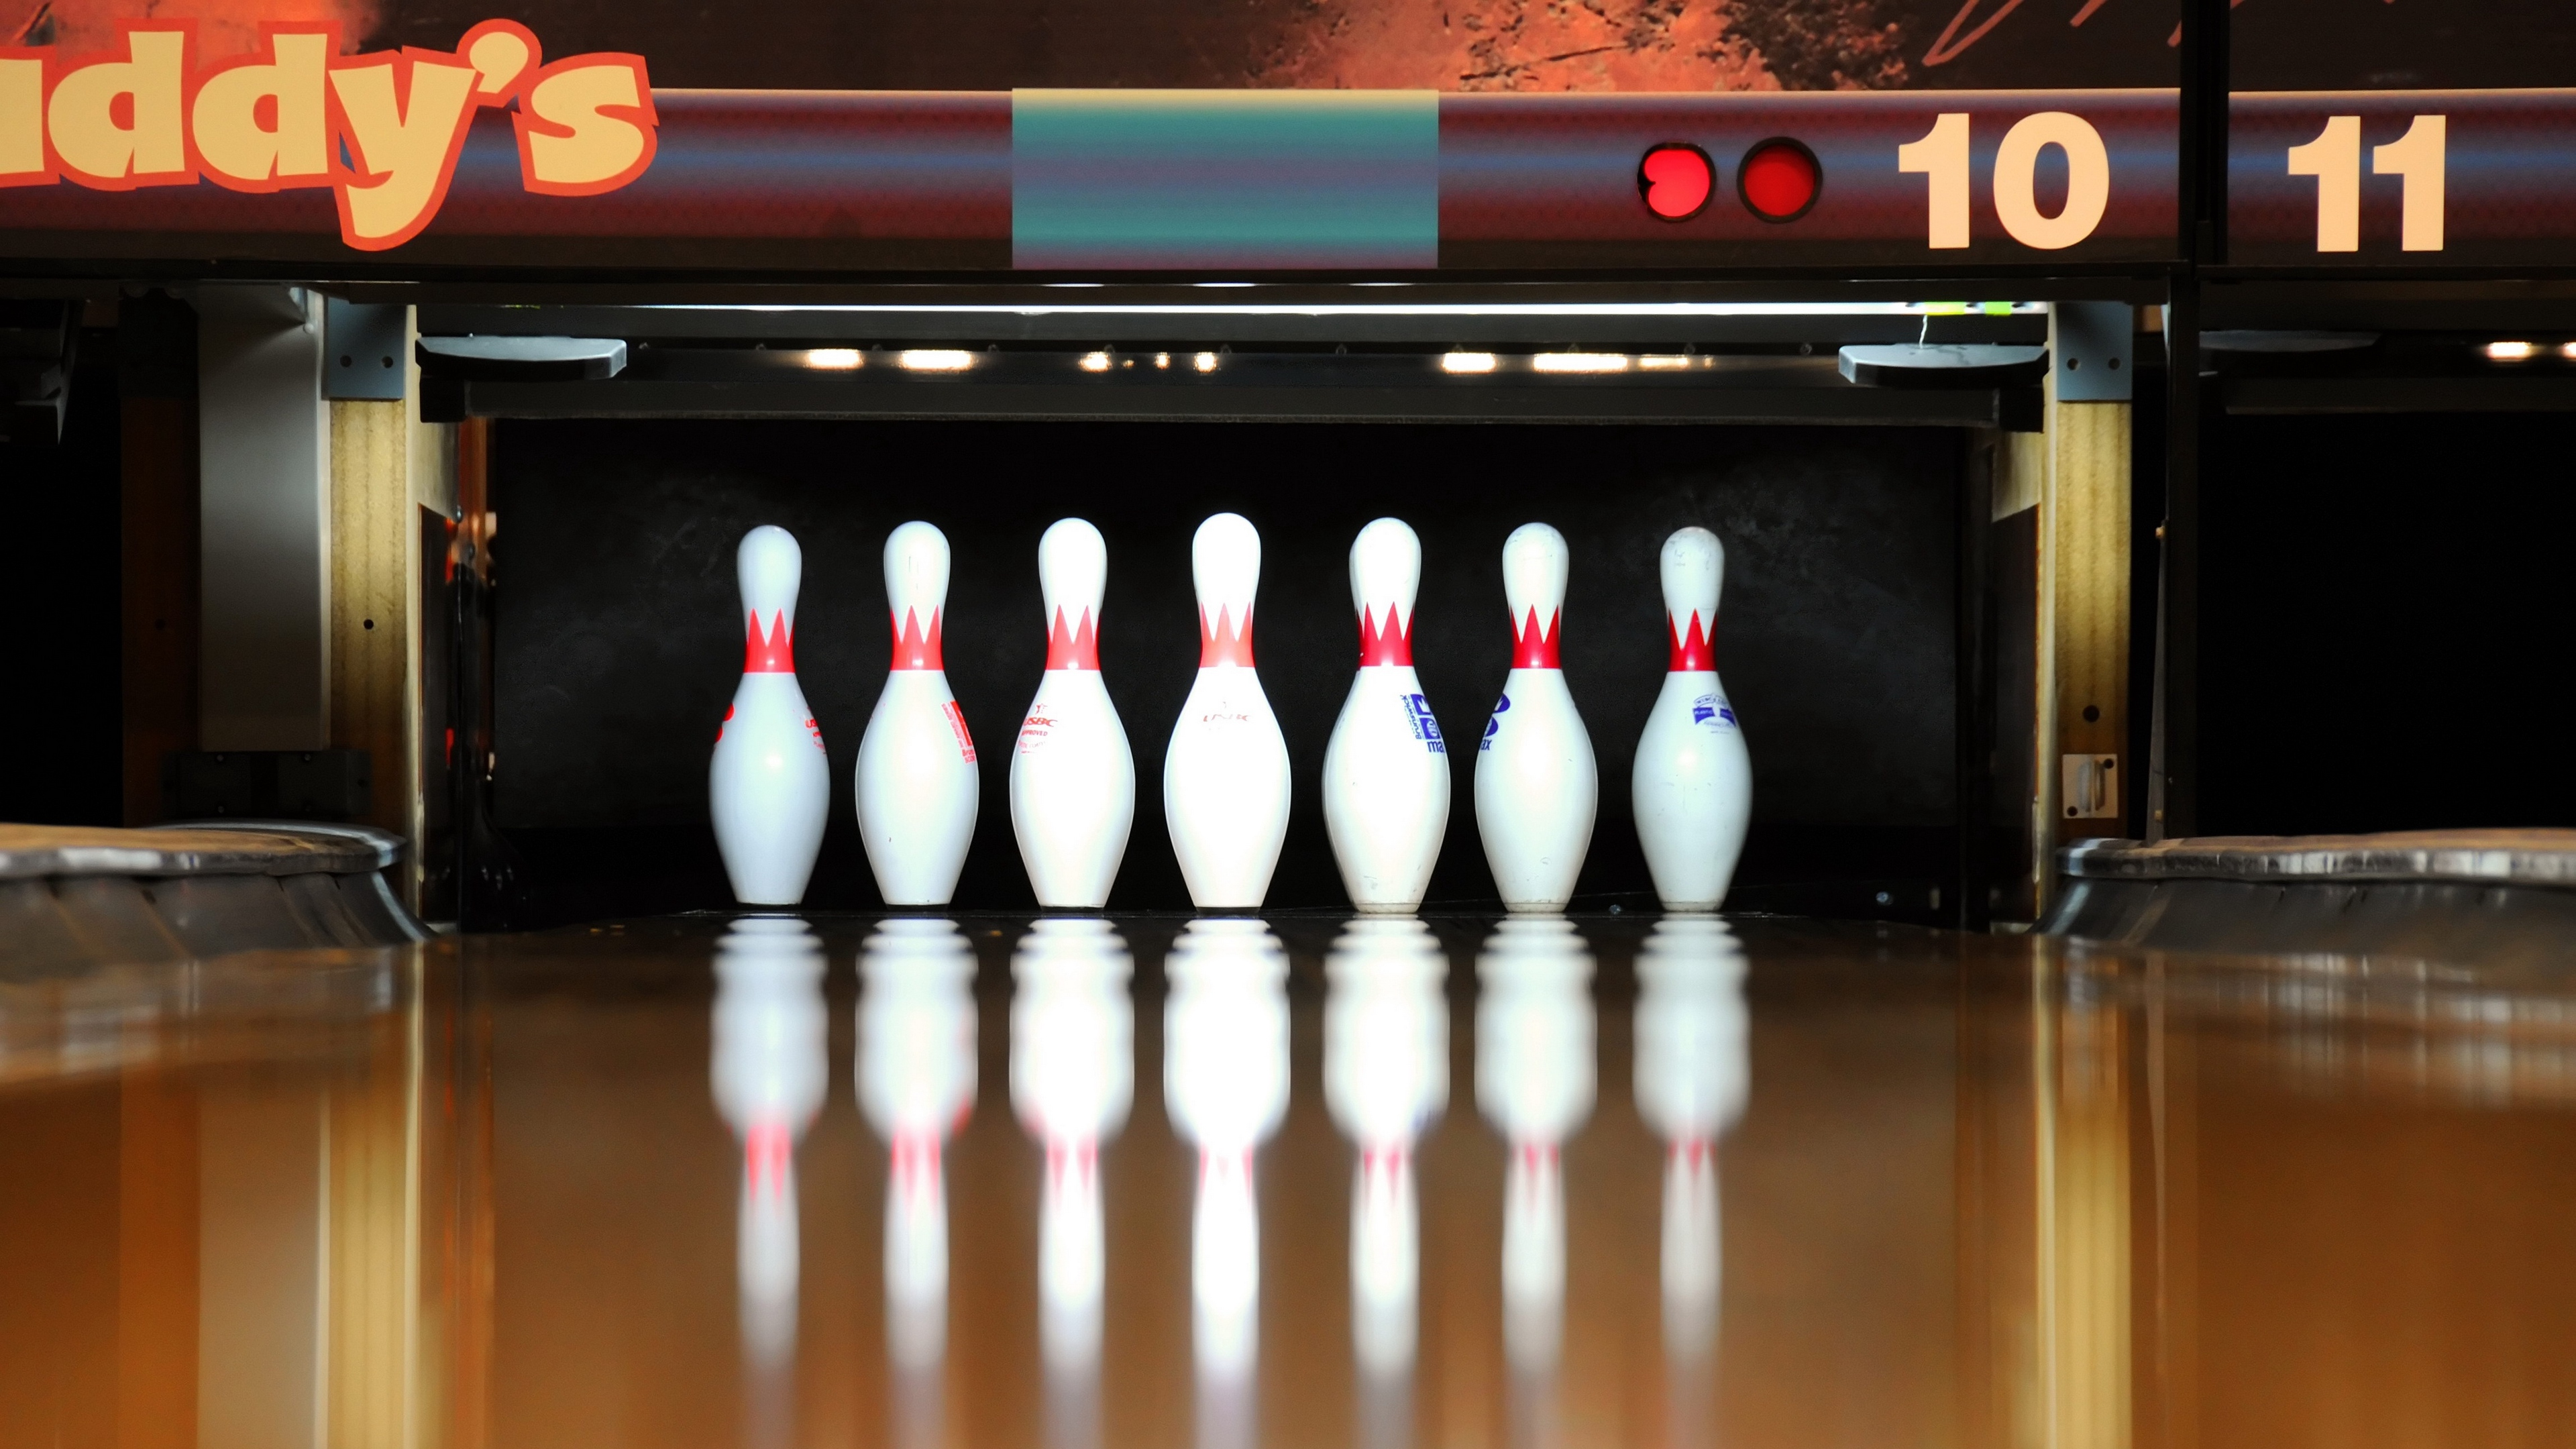 skittles bowling reflection 4k 1540062562 - skittles, bowling, reflection 4k - skittles, reflection, bowling